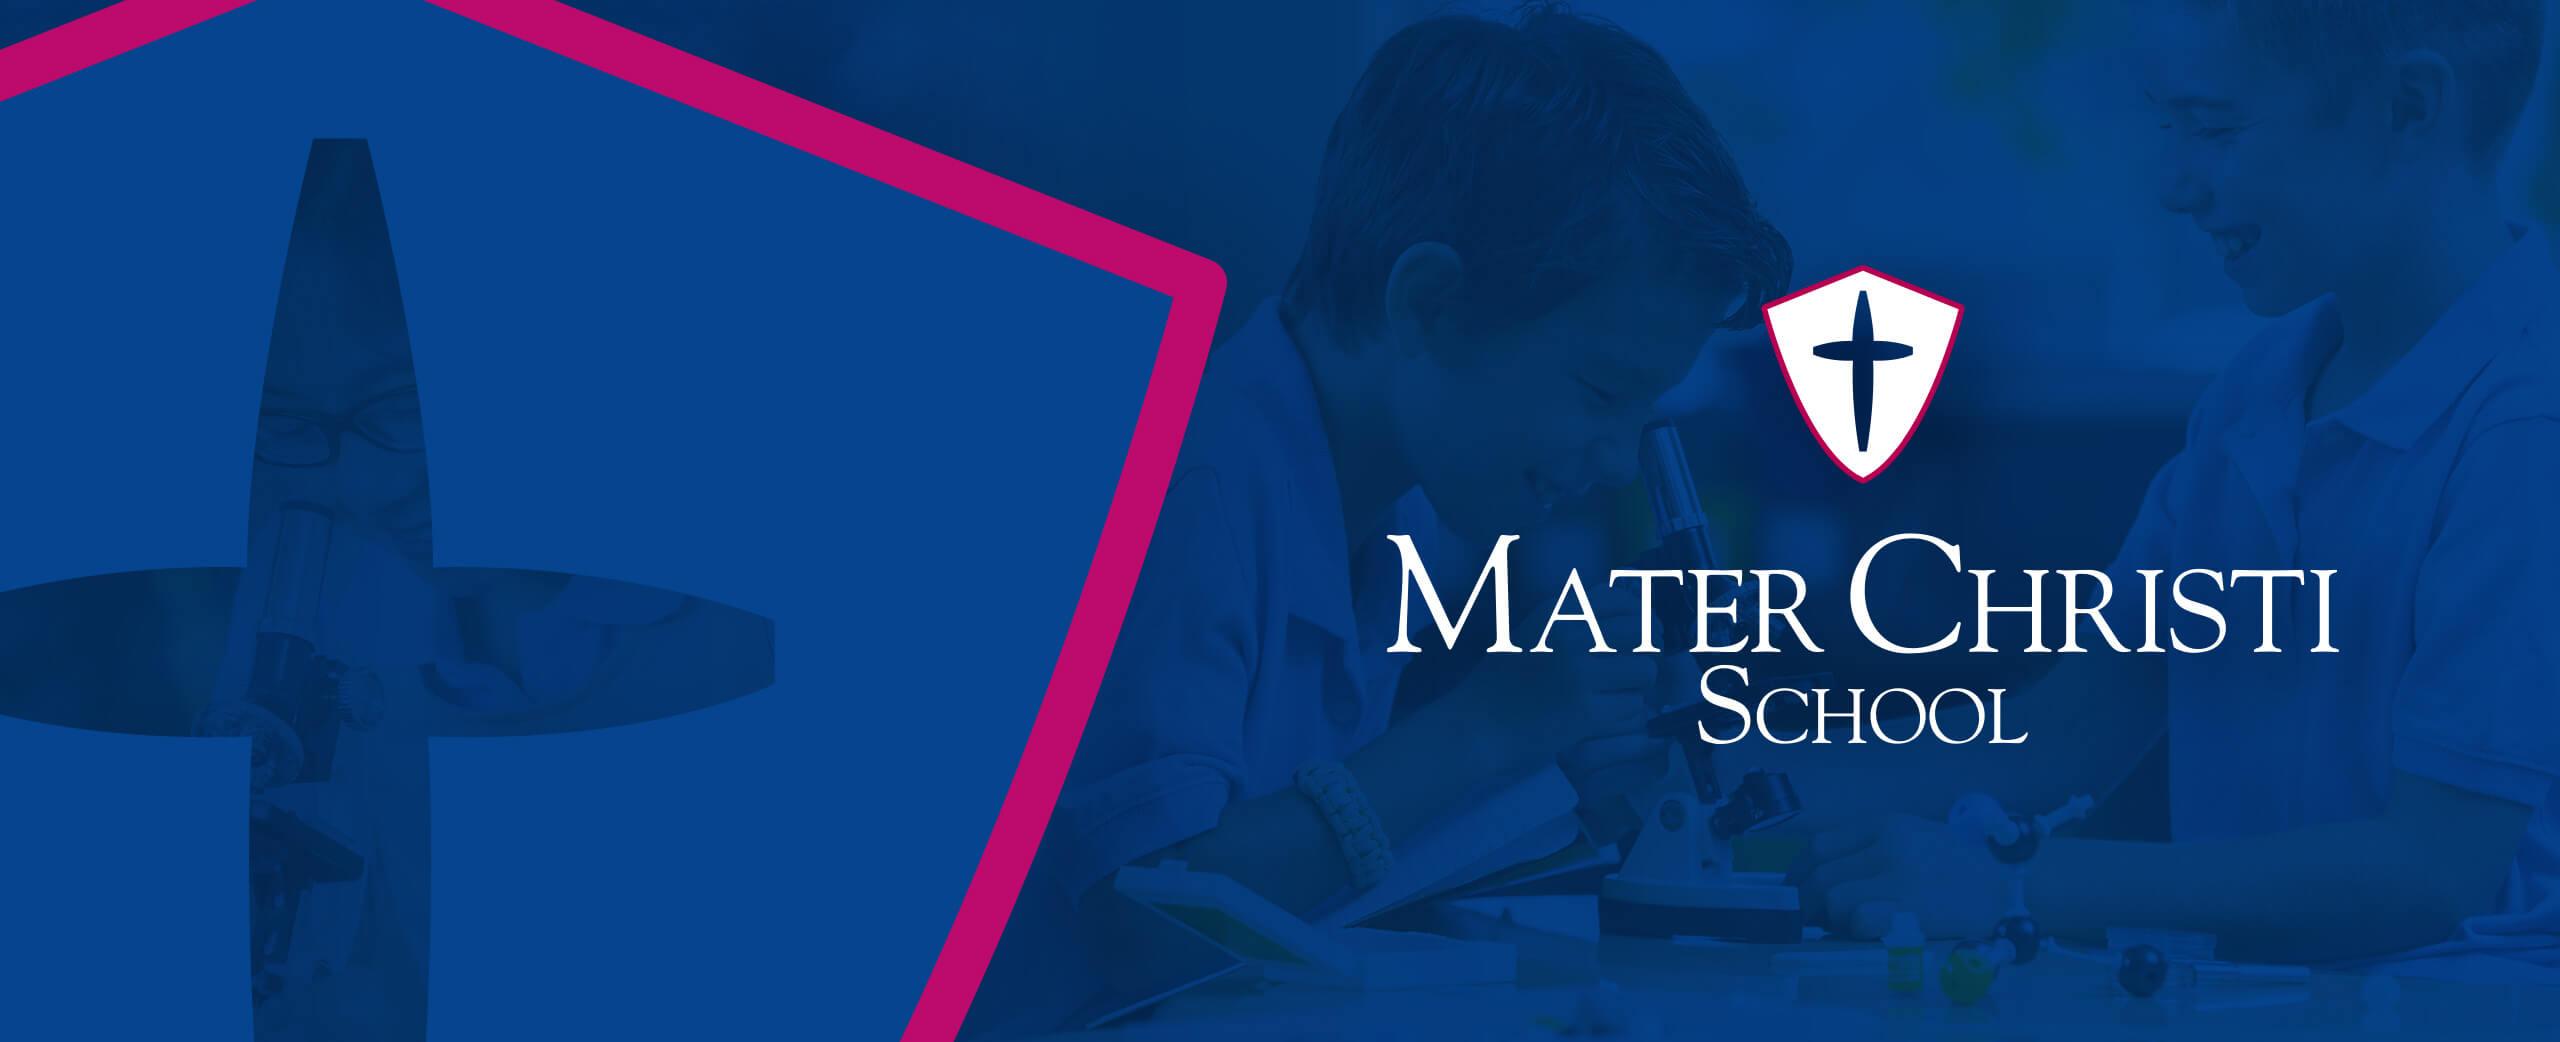 dmg-logos-mater-christi-school